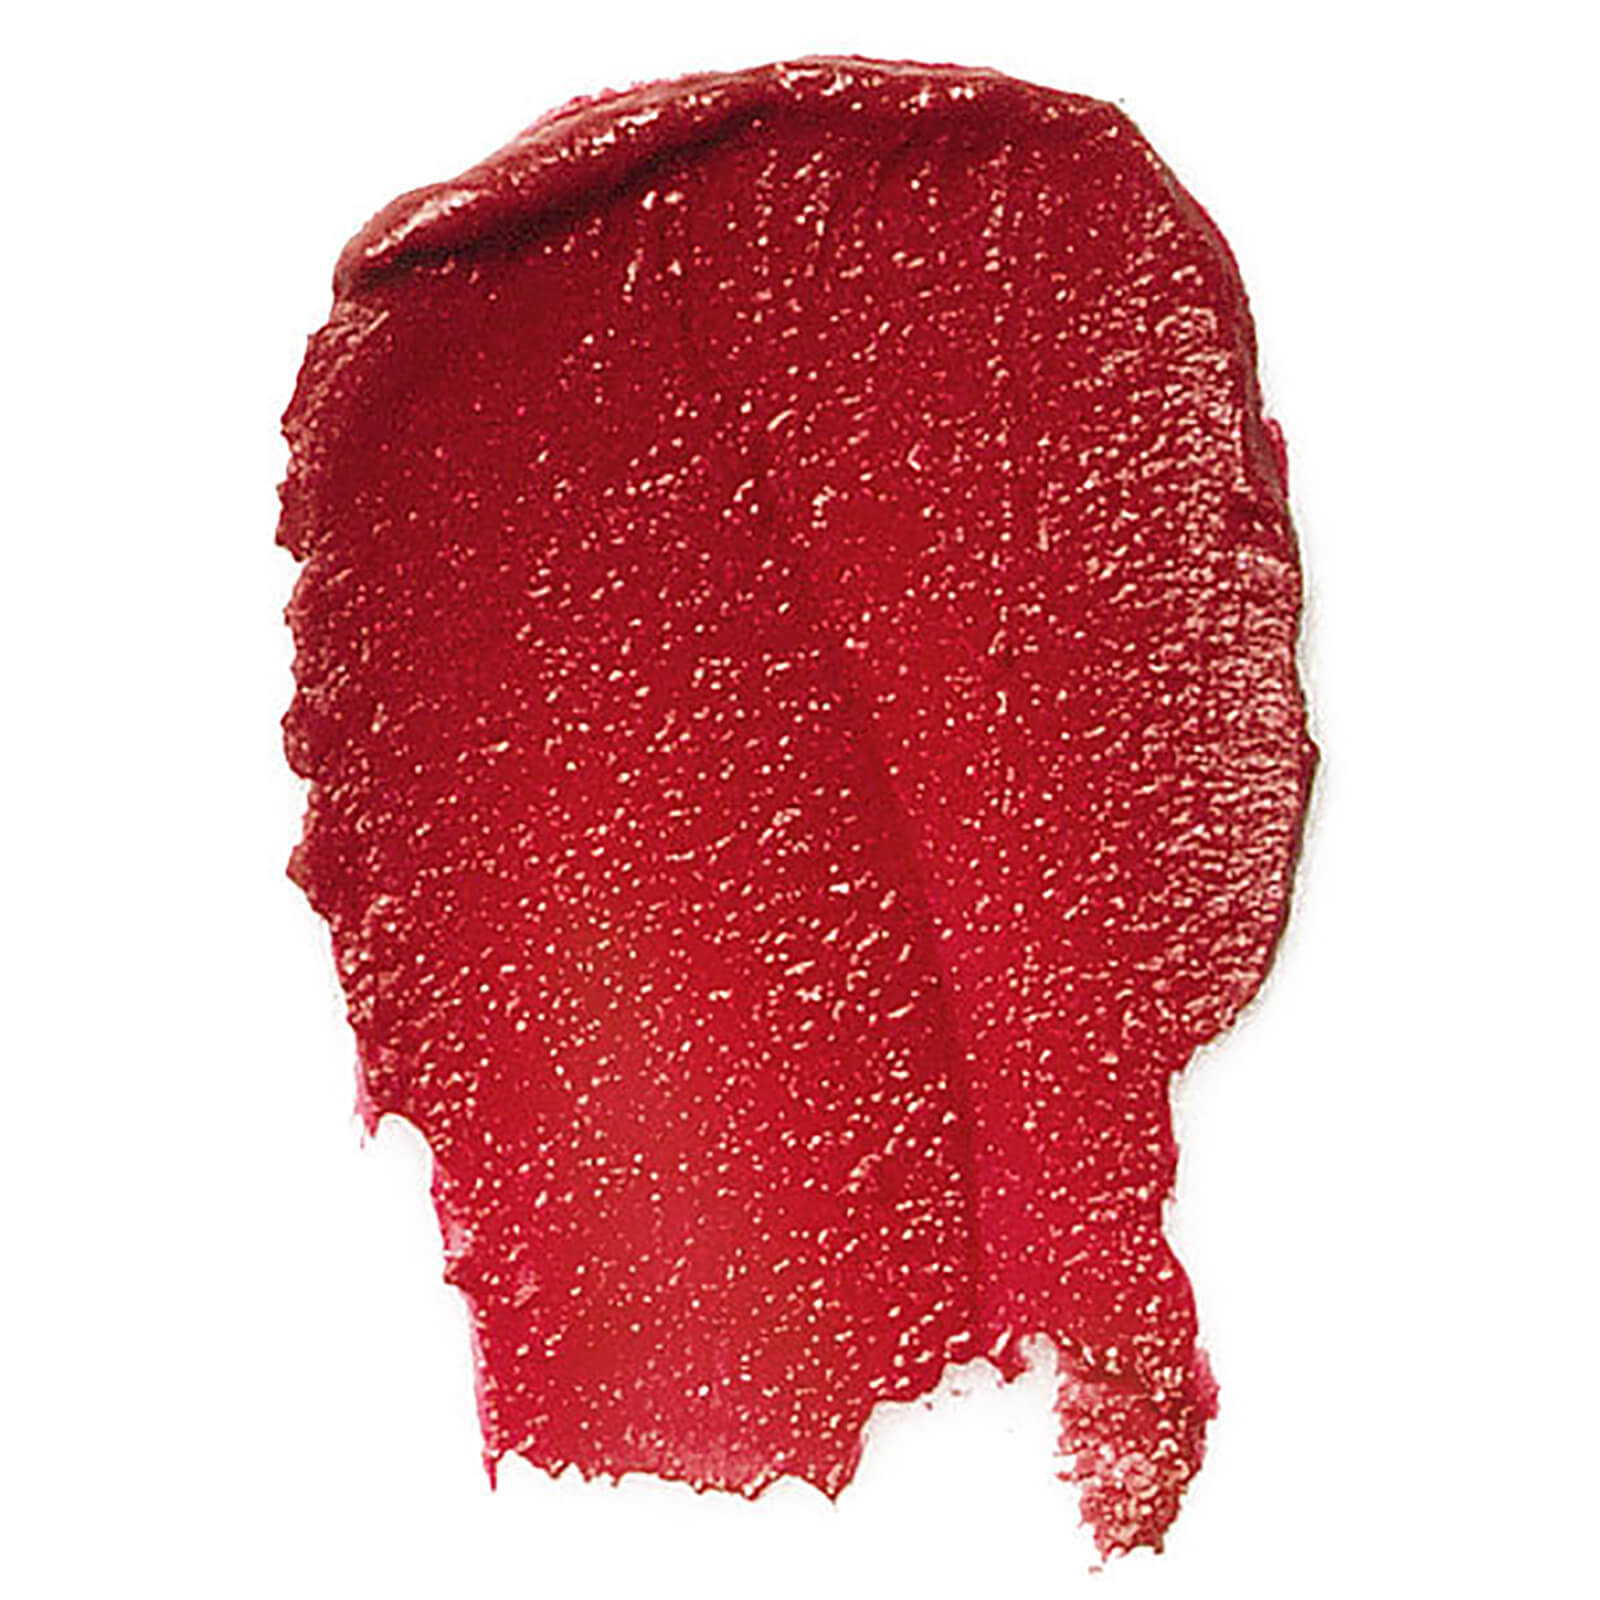 Bobbi Brown Luxe Lip Color (Various Shades) - Parisian Red